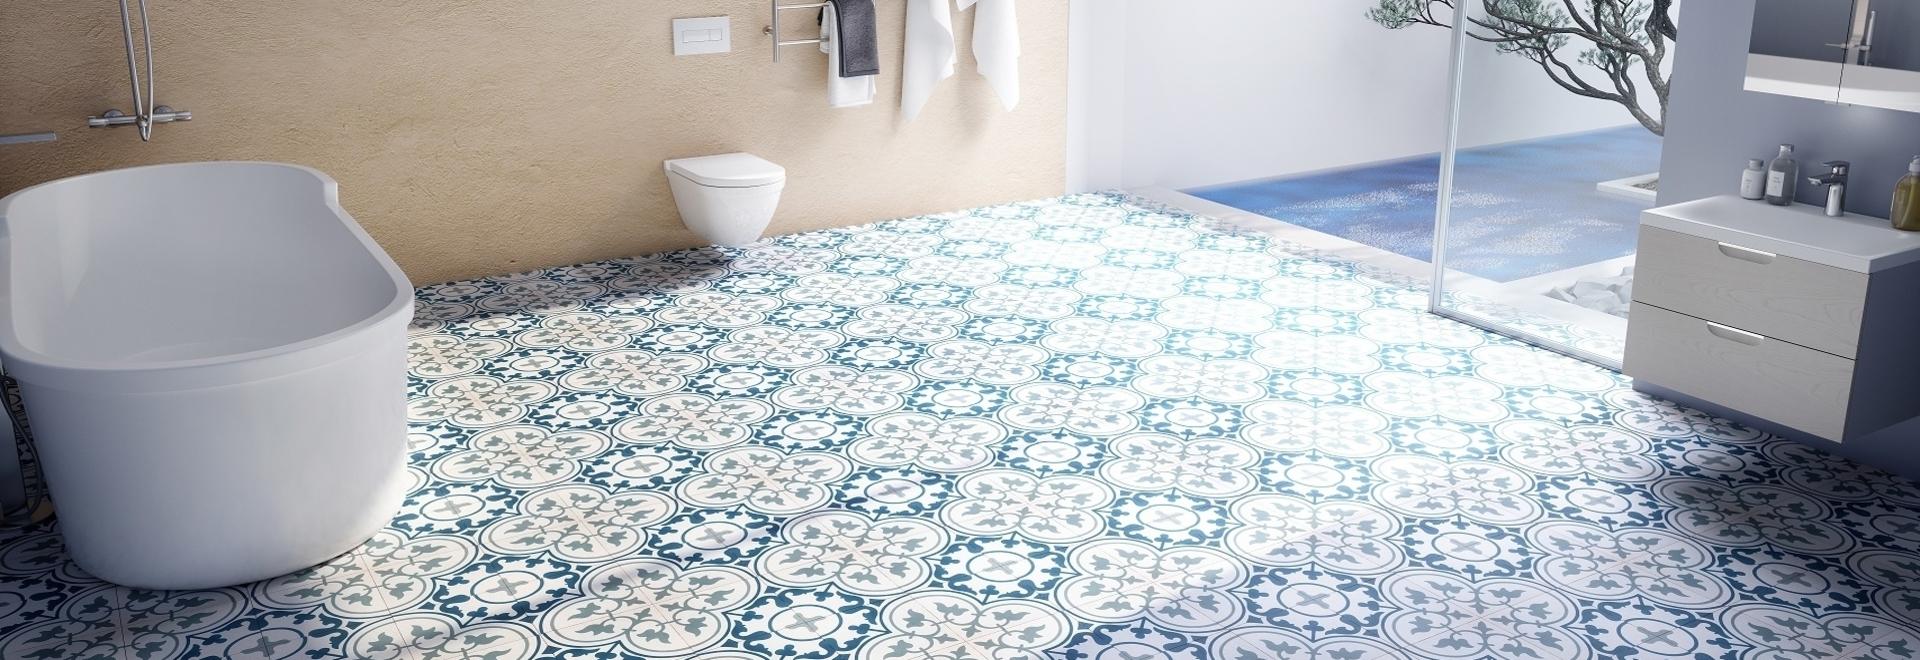 Encaustic Tiles Torrastone non-slip class C3